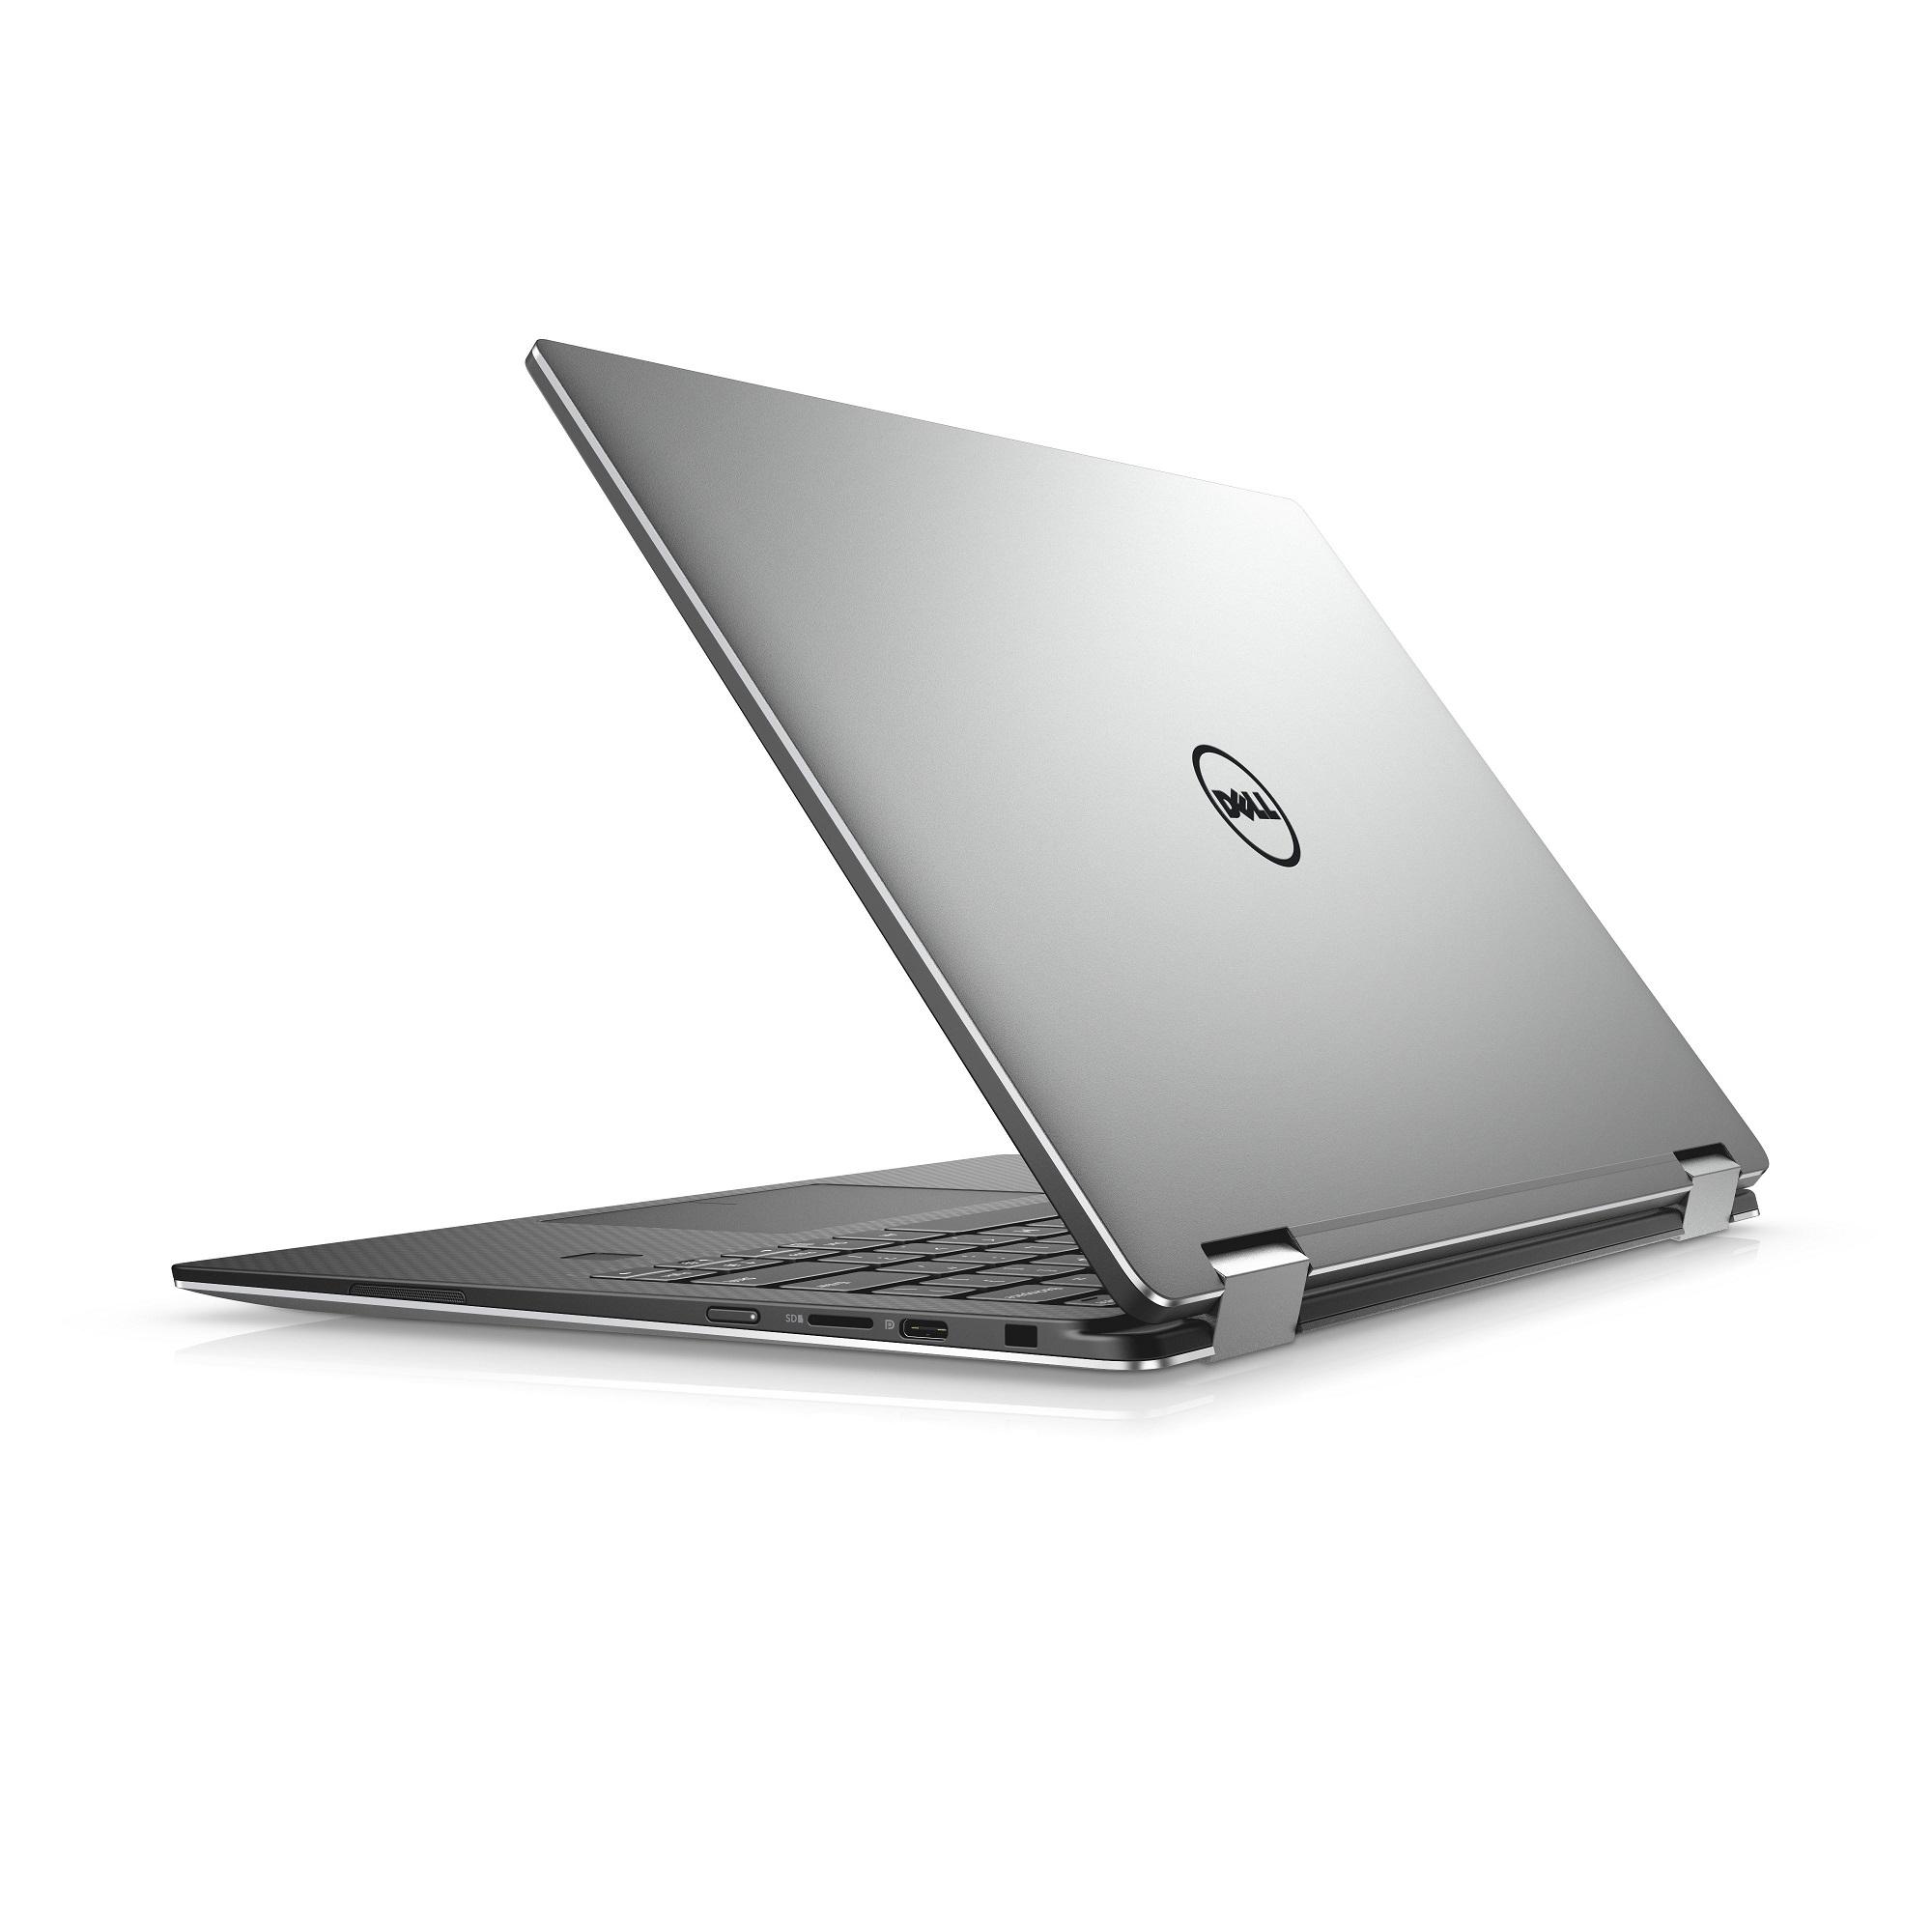 "DELL Ultrabook XPS 13 (9365)/i7-7Y57/8GB/256GB SSD/Intel HD/13.3"" FHD Touch/Win 10 Pro/Black"